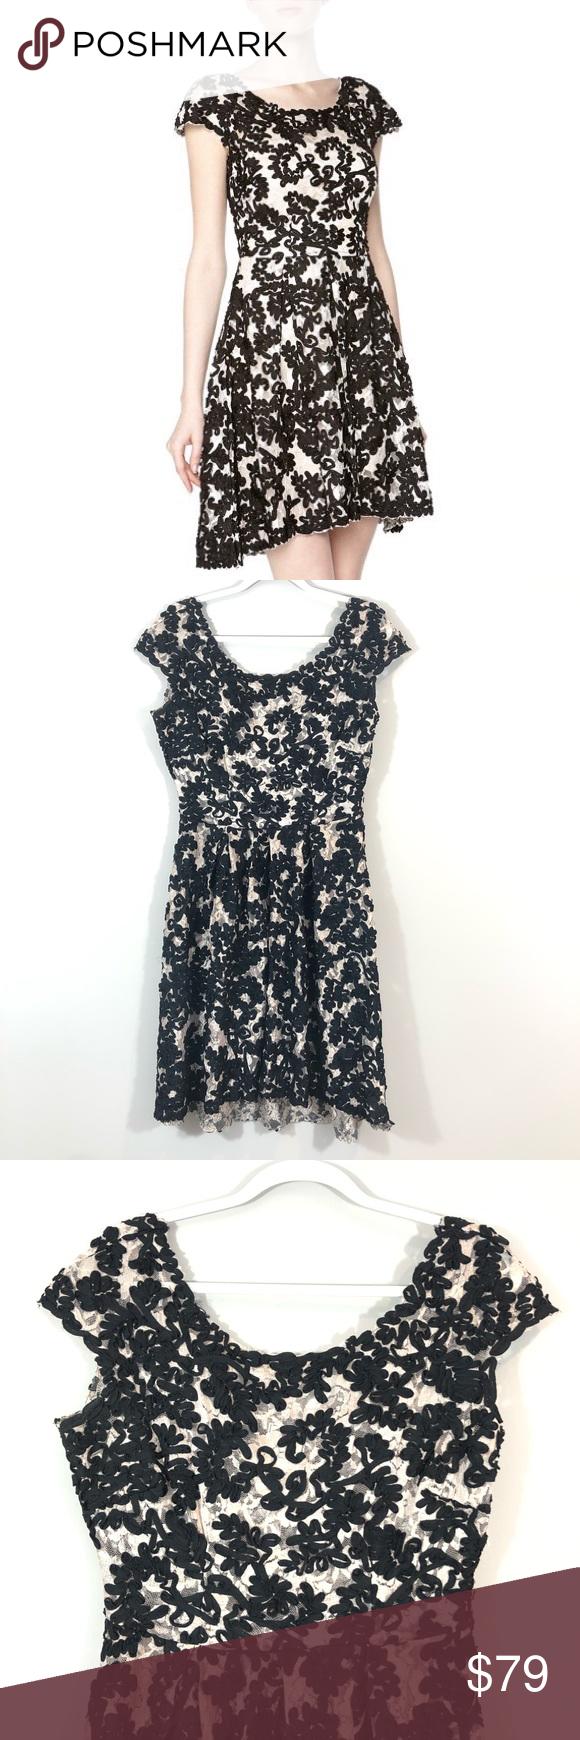 Yoana Baraschi Anthro Black Cream Lace Dress Lace Dress Cream Lace Dress Cream Lace [ 1740 x 580 Pixel ]